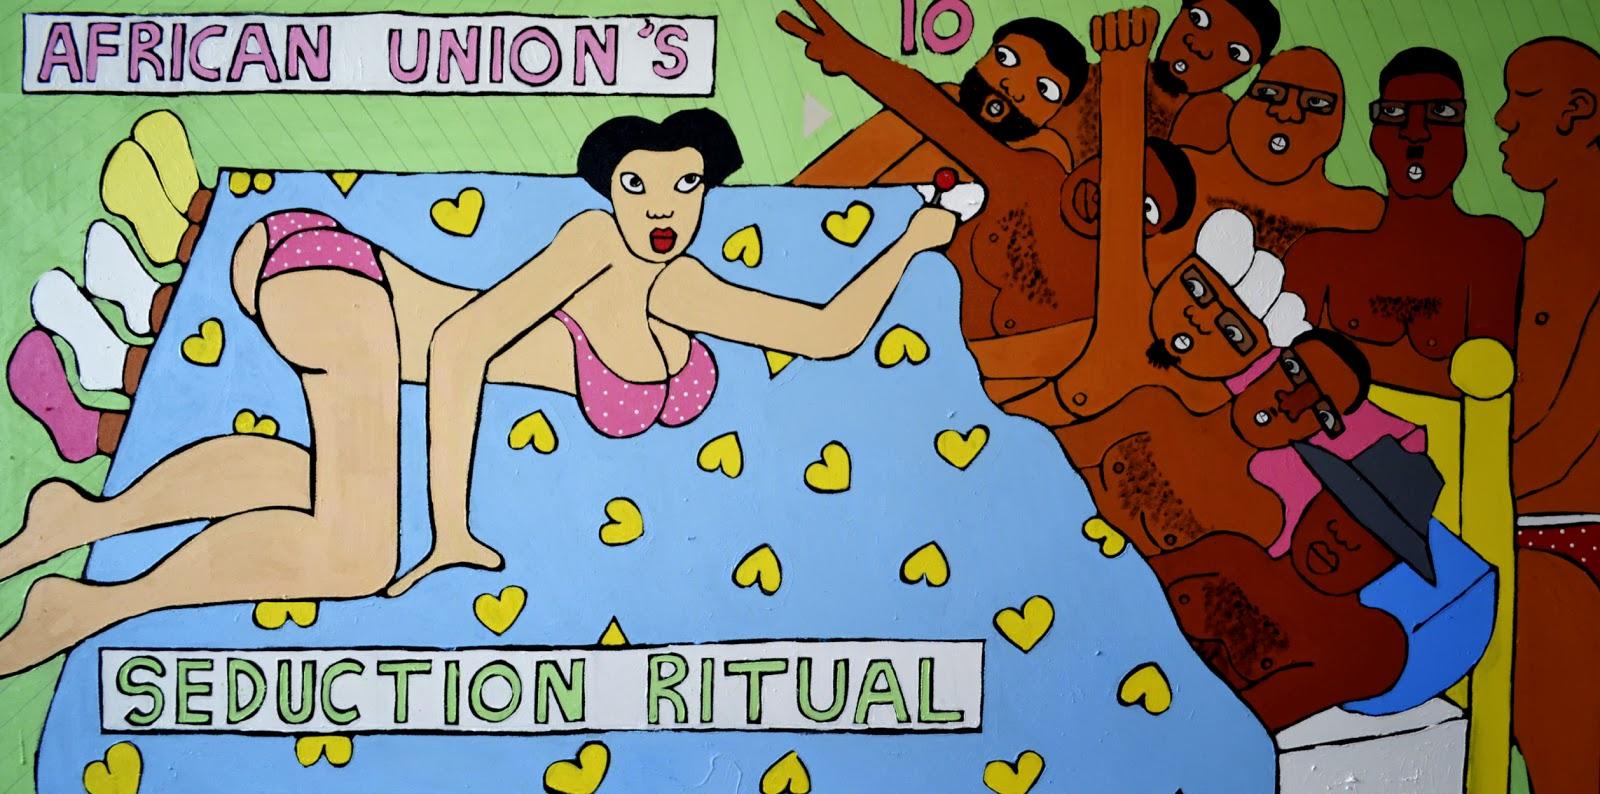 Seduction ritual